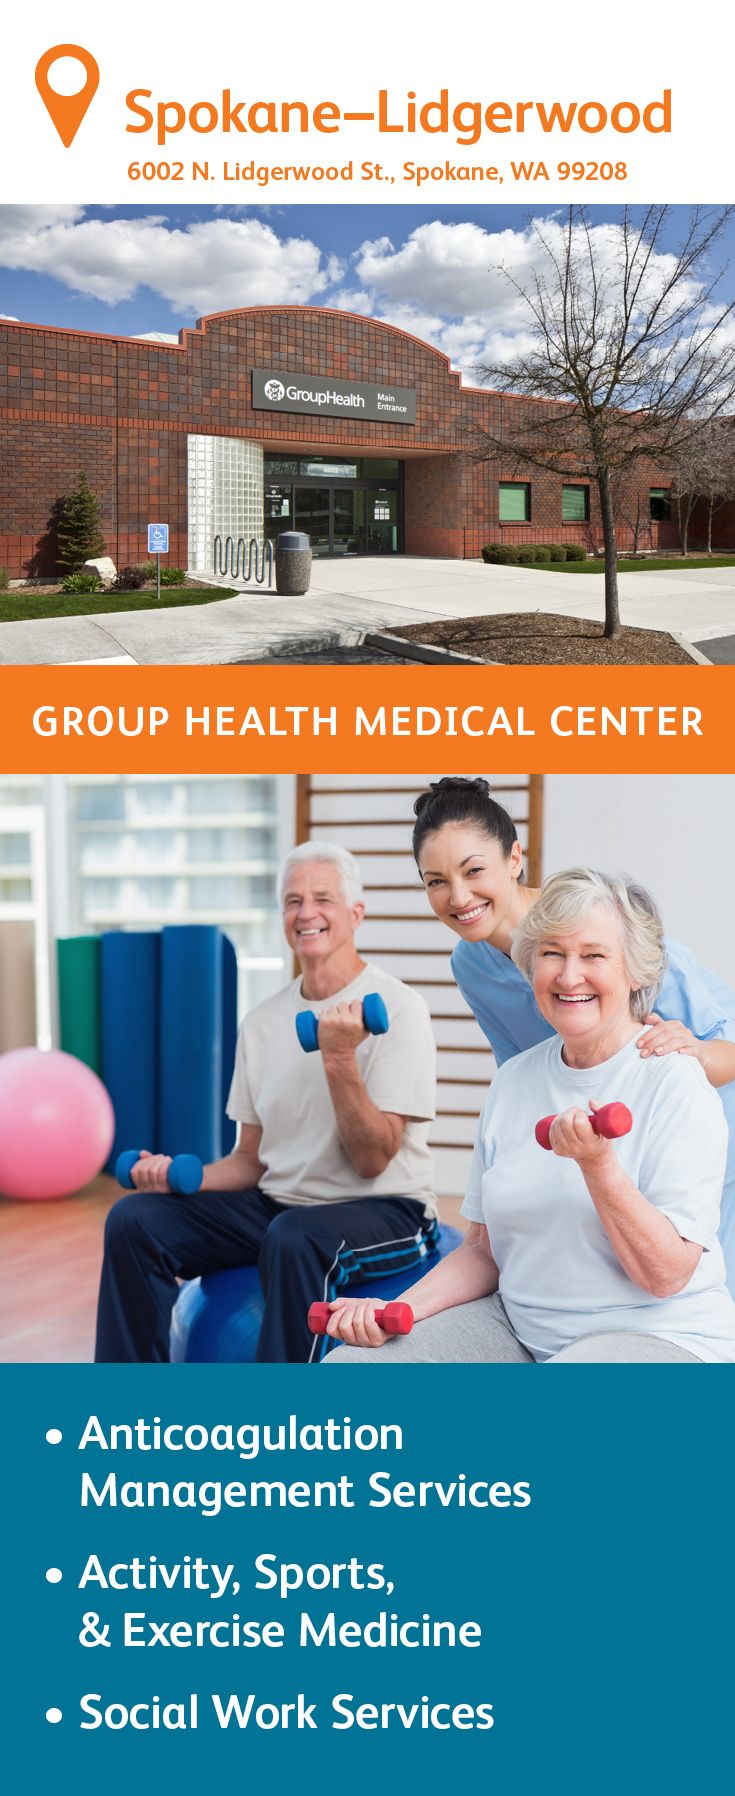 The Group Health Lidgerwood Medical Center in Spokane